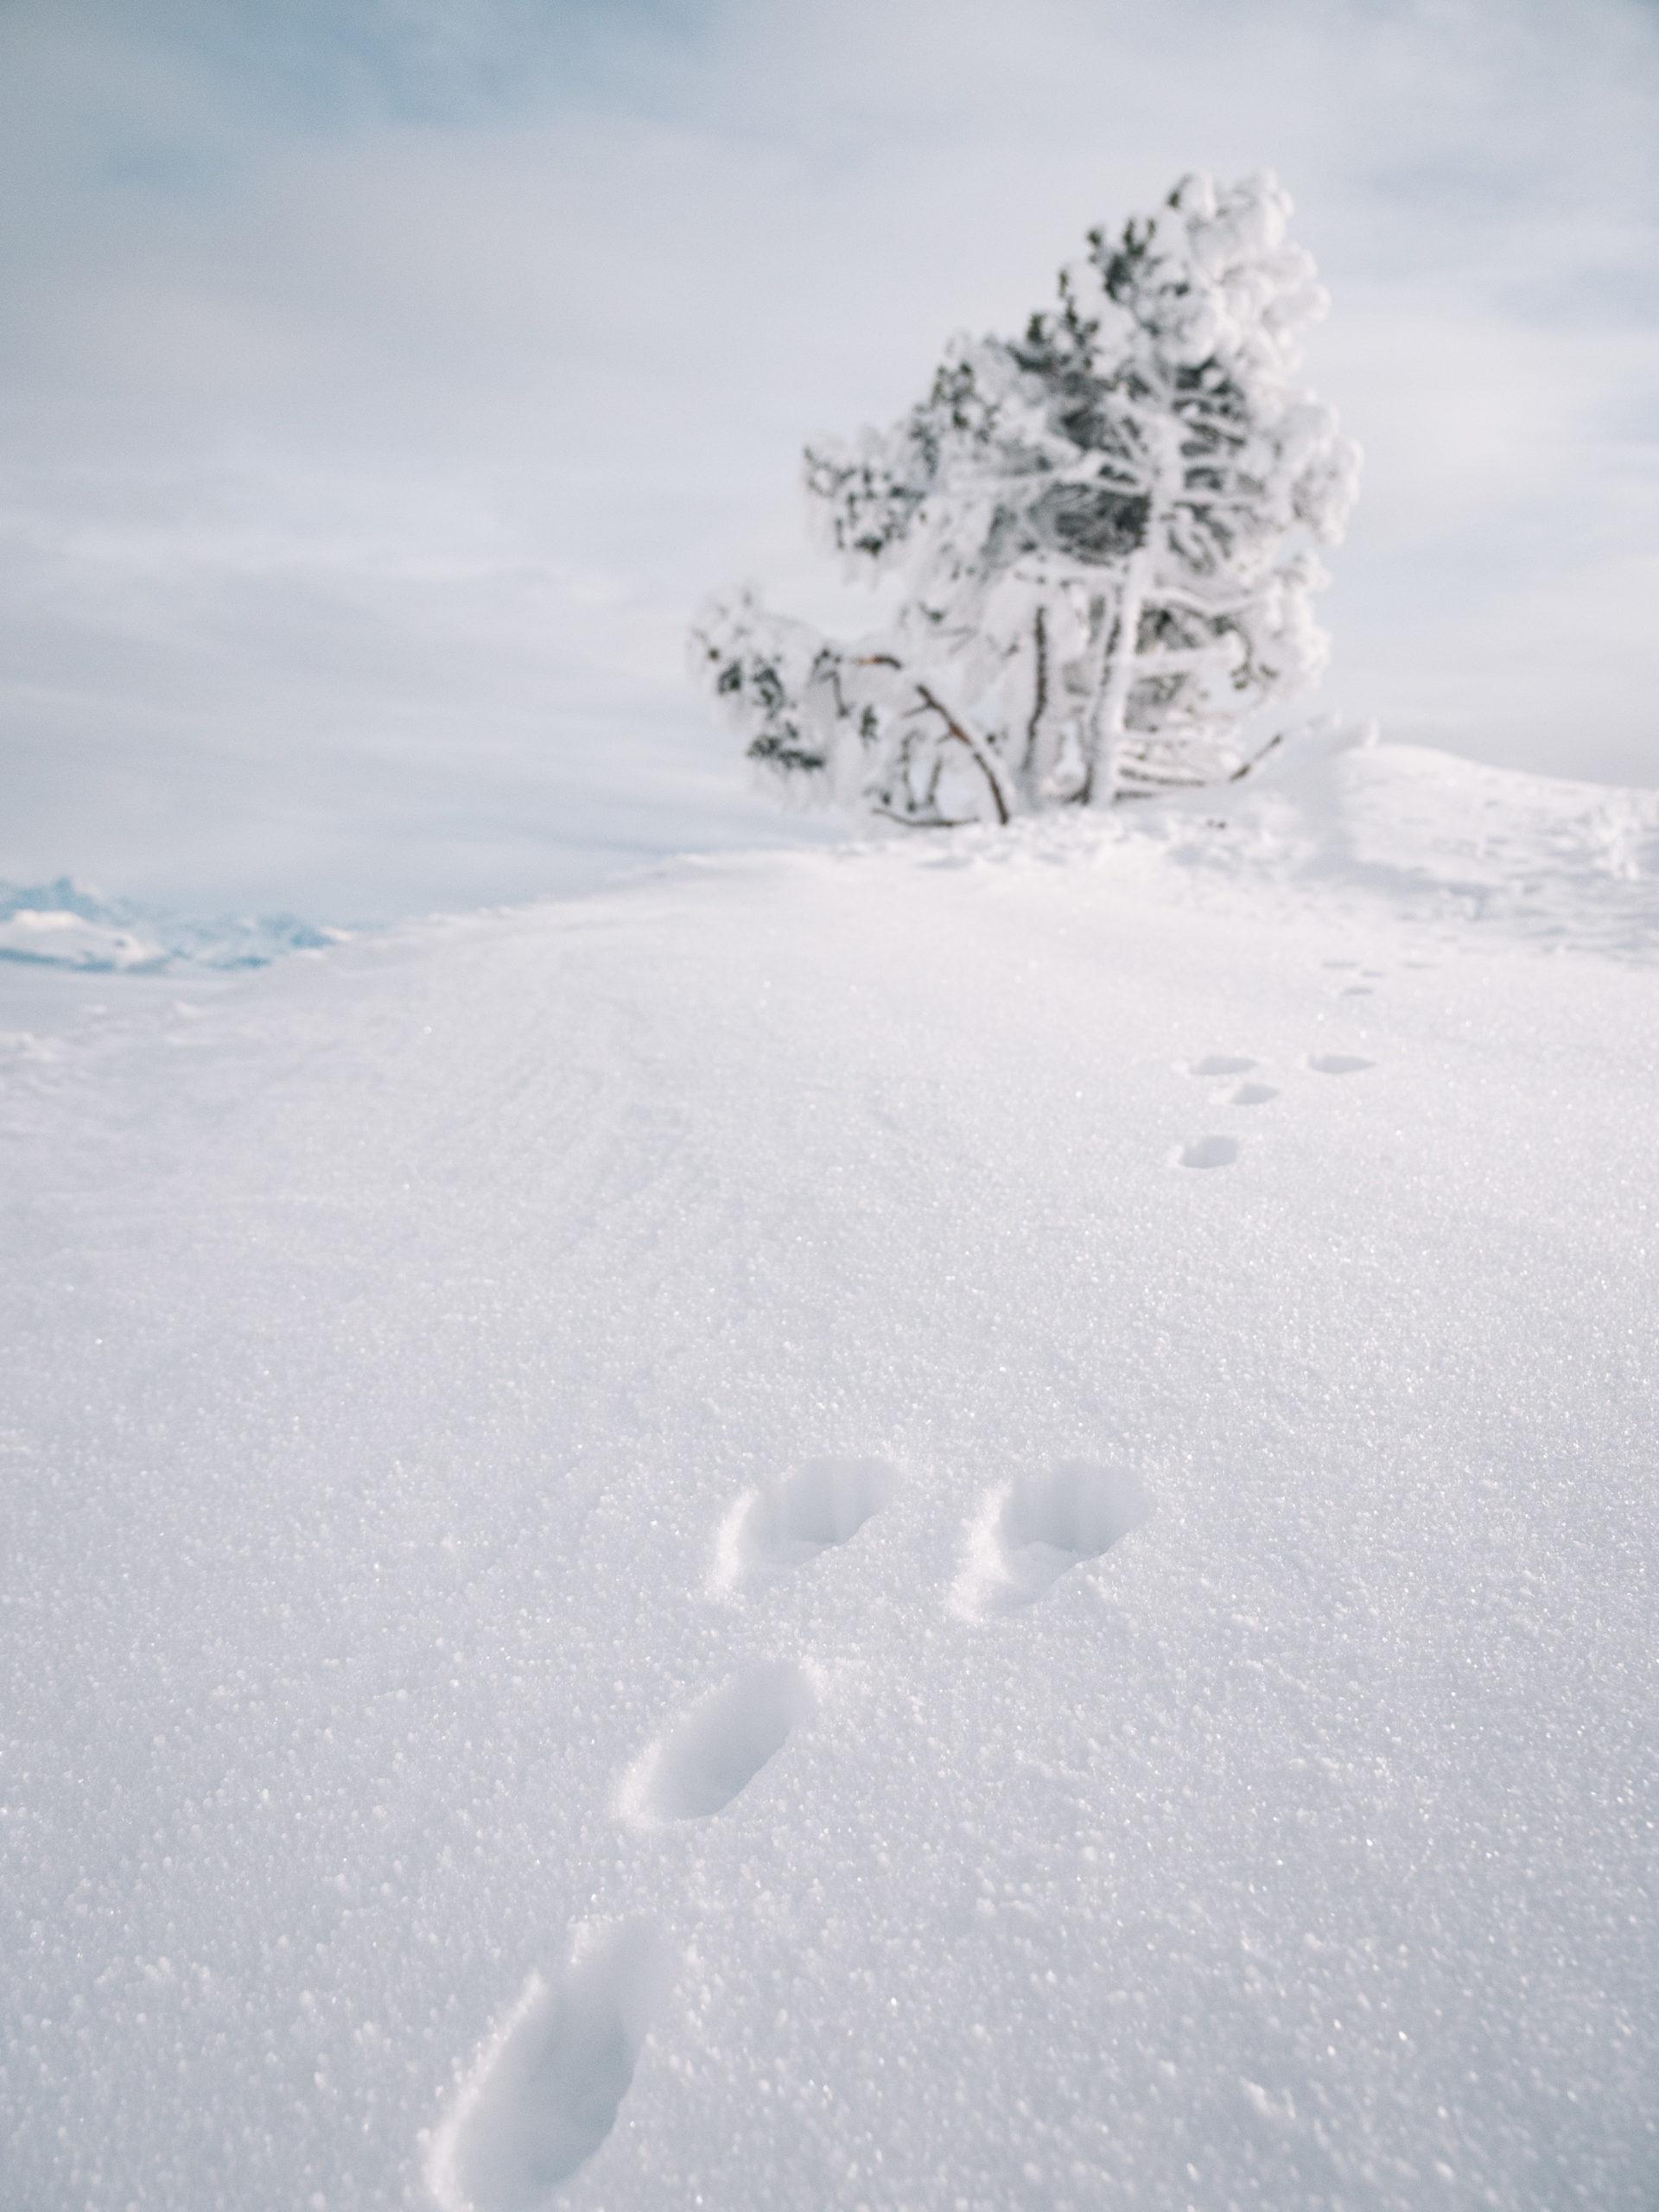 traces de renard dans la neige